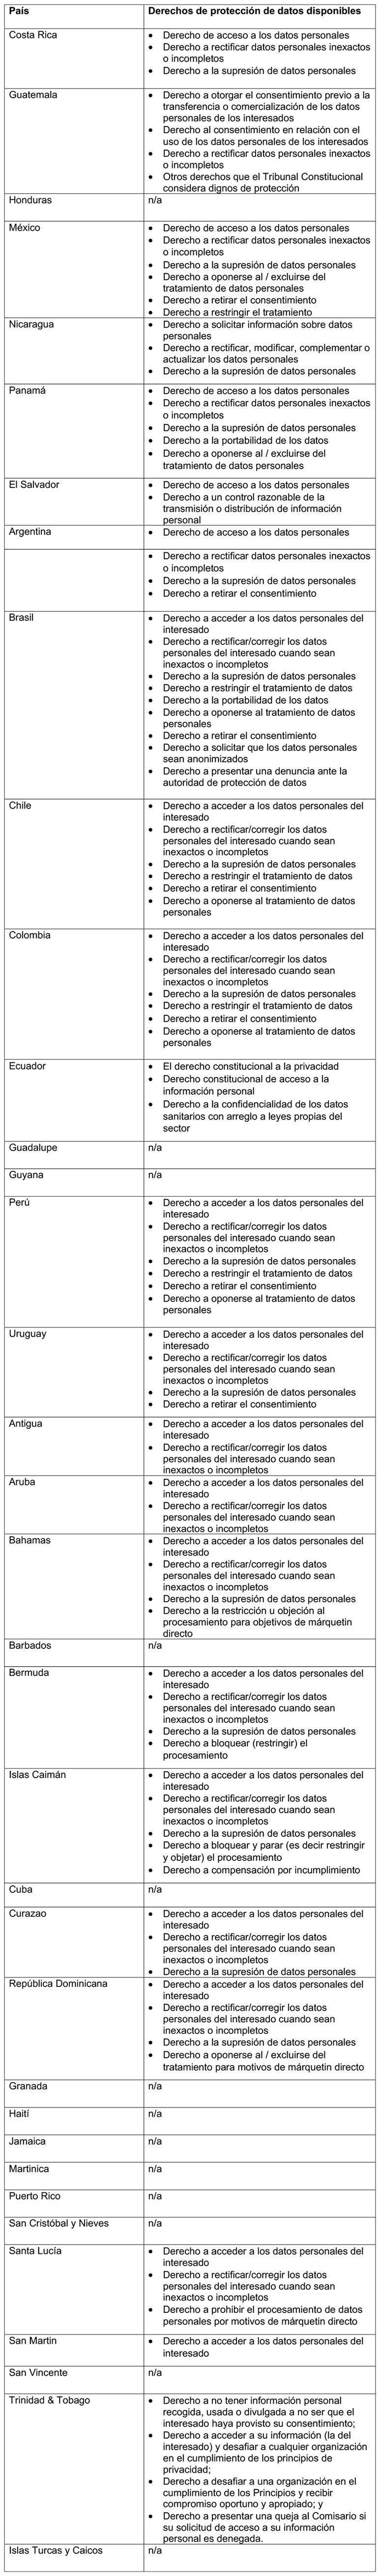 Privacy-022521-3-Spanish